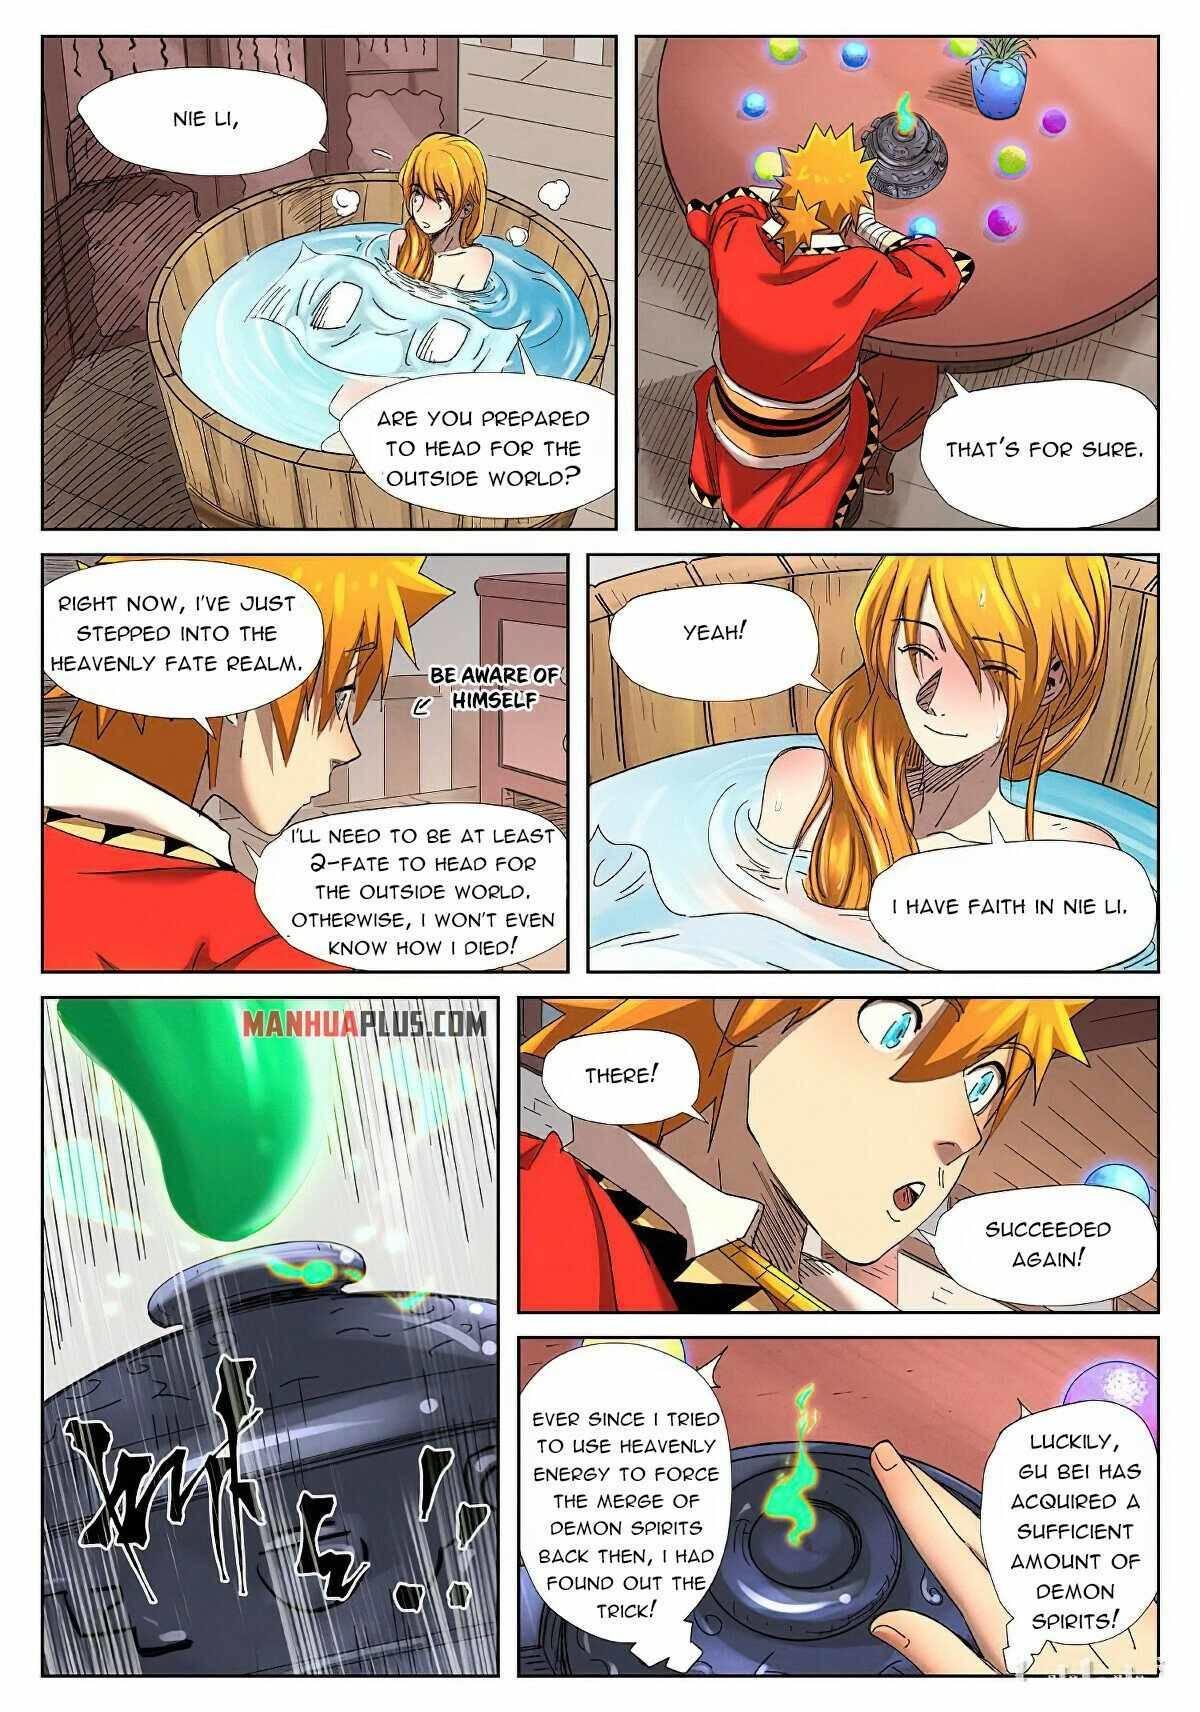 Tales Of Demons And Gods Chapter 343.5 page 9 - Mangakakalot